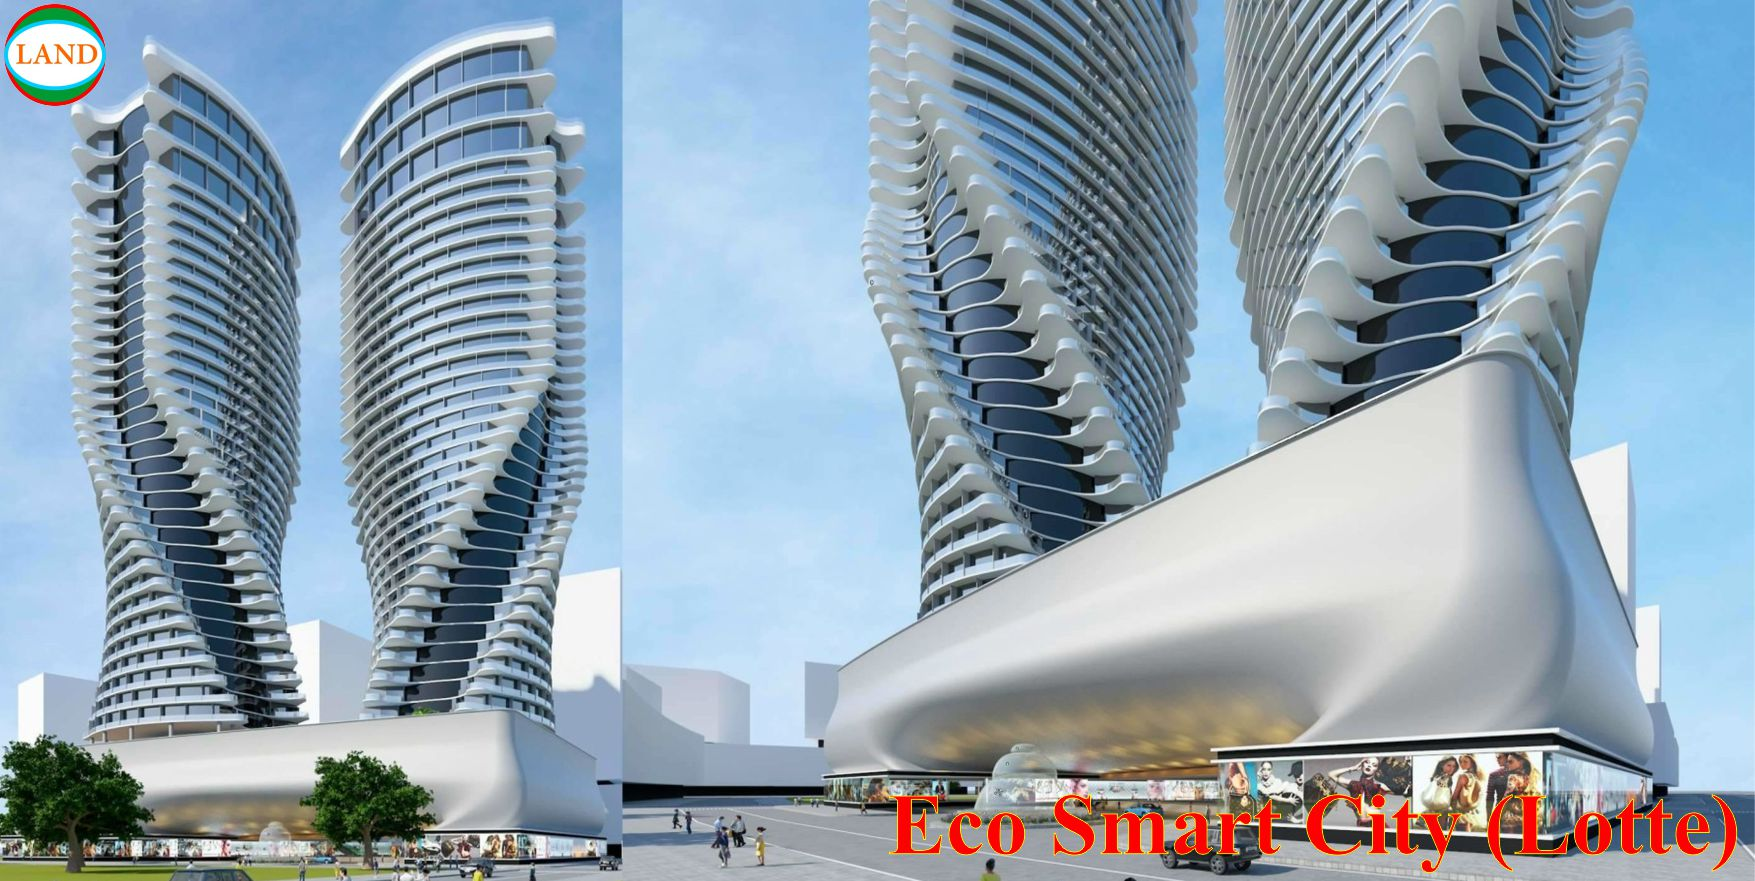 Eco Smart City (Lotte Thủ Thiêm)